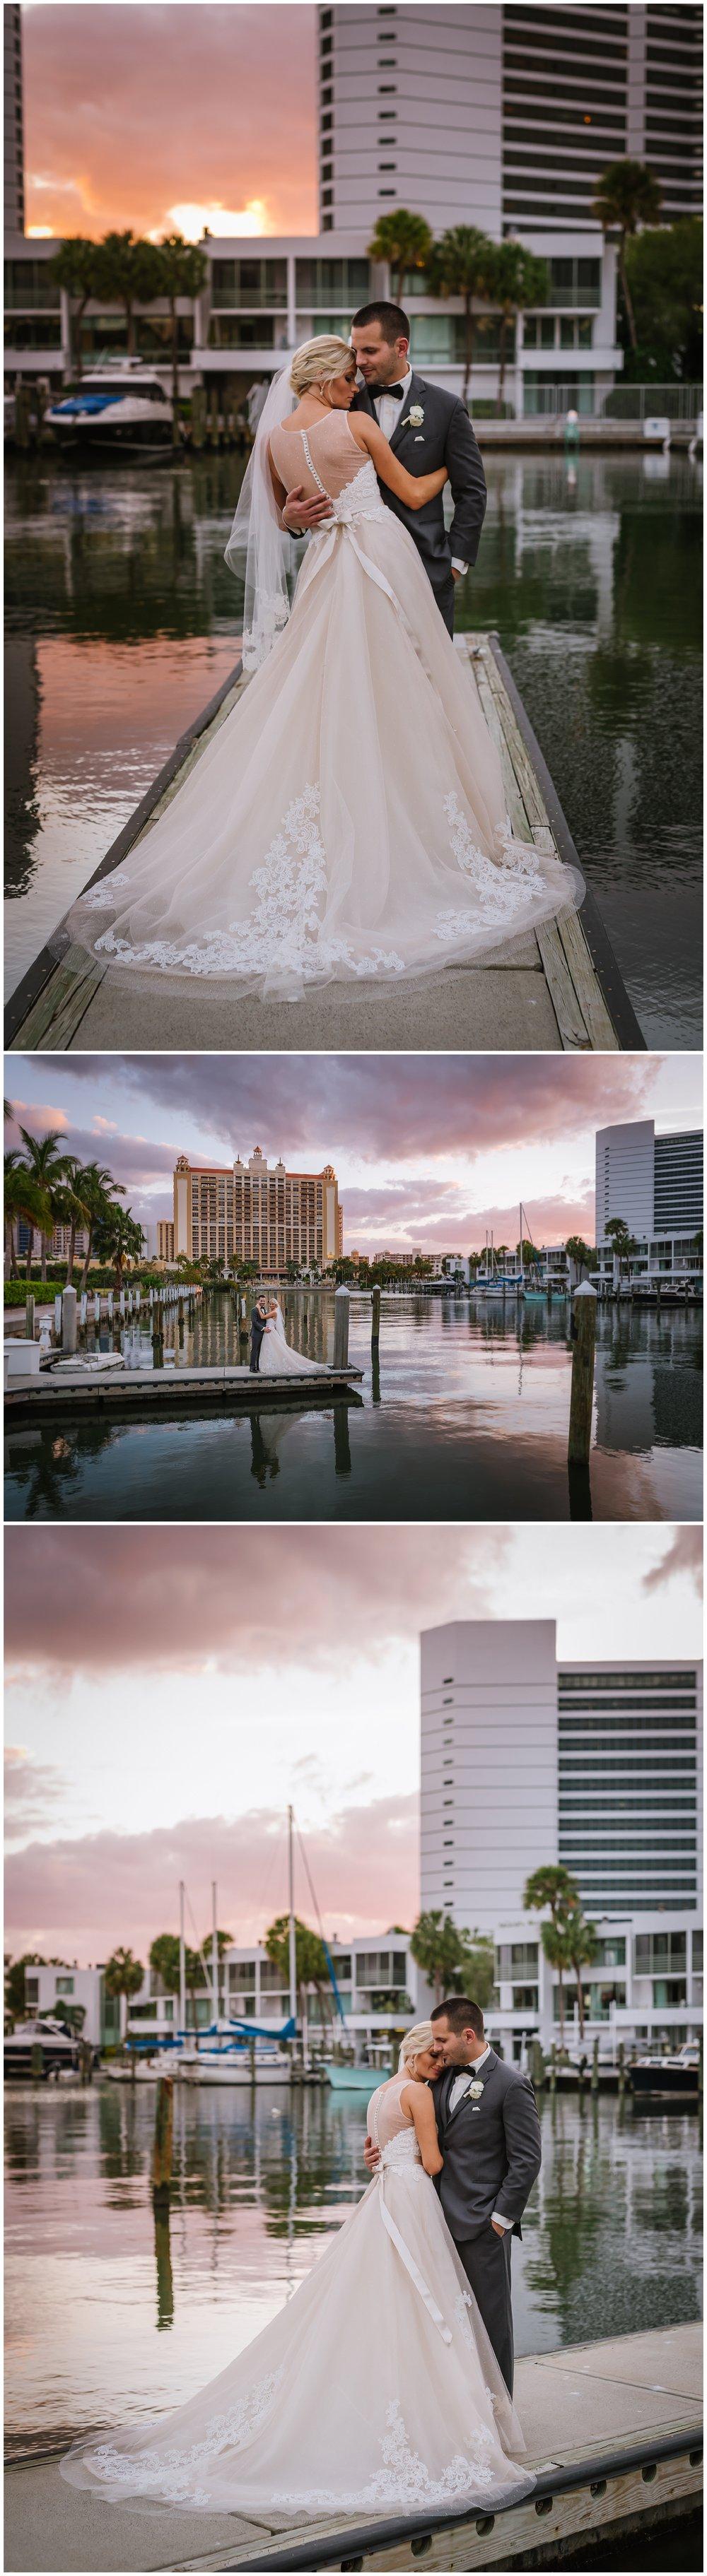 Sarasota-wedding-photographer-hyatt-regency-blush_0052.jpg